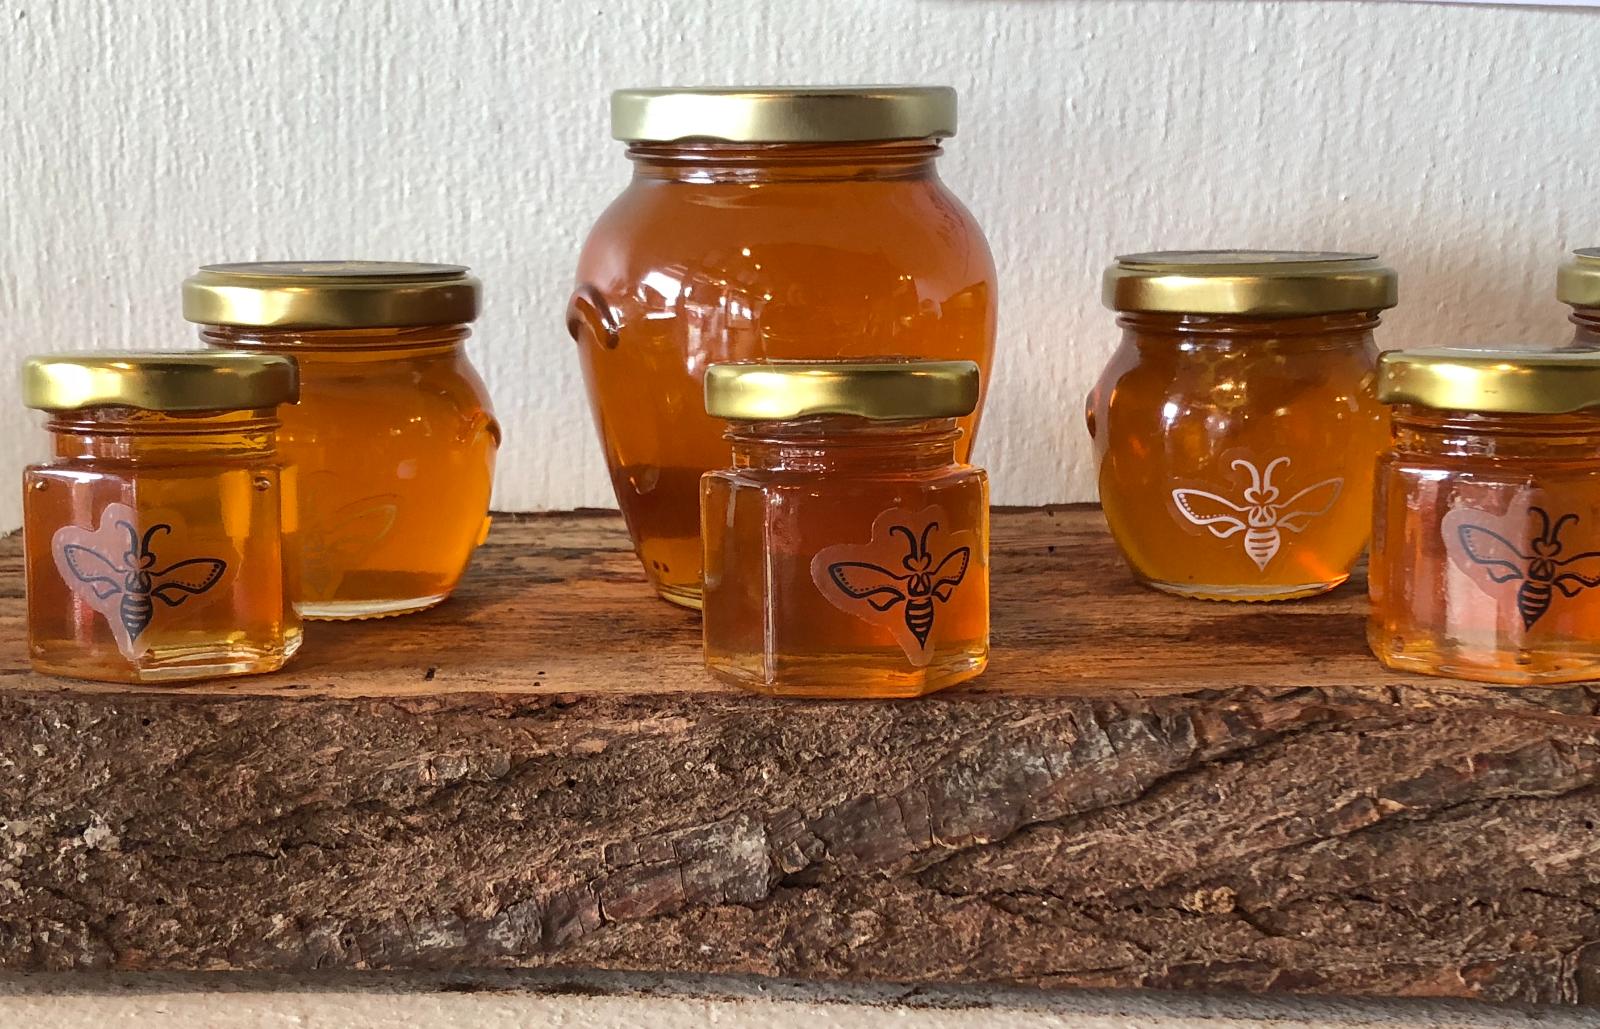 100 pure raw chunk honey comb in jar of raw honey 1 lb - HD1600×1029